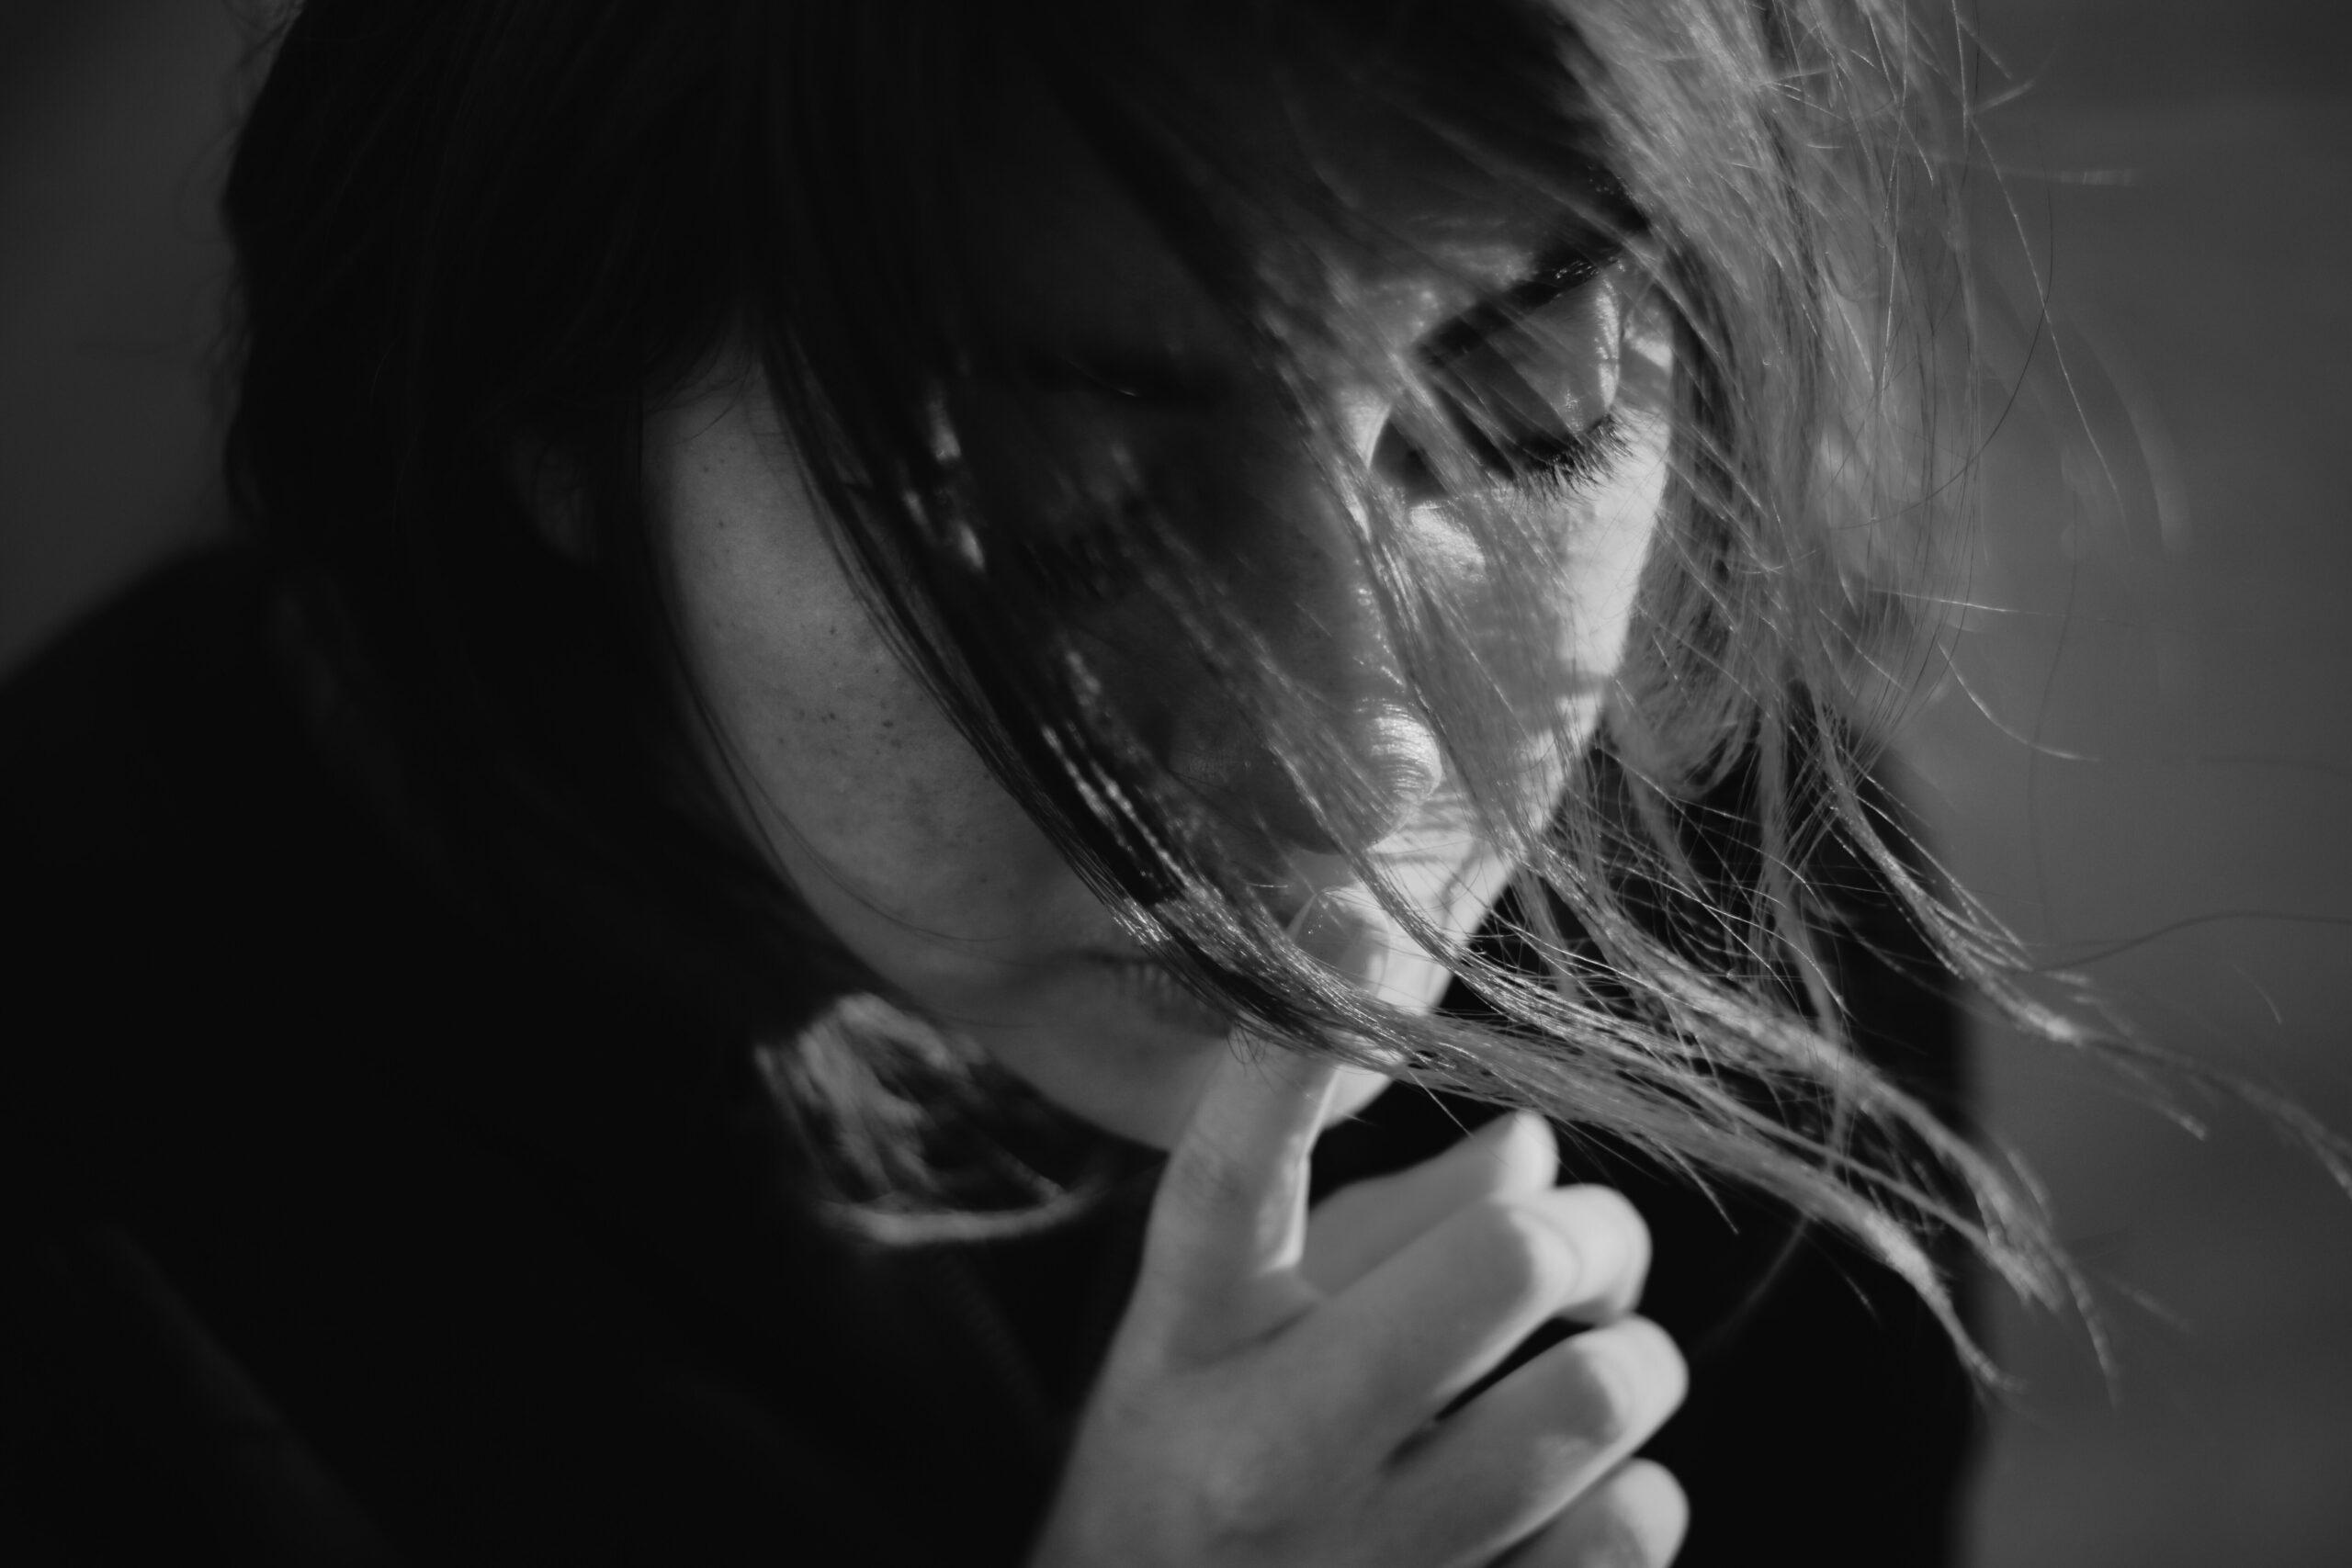 Domestic abuse has risen in lockdown